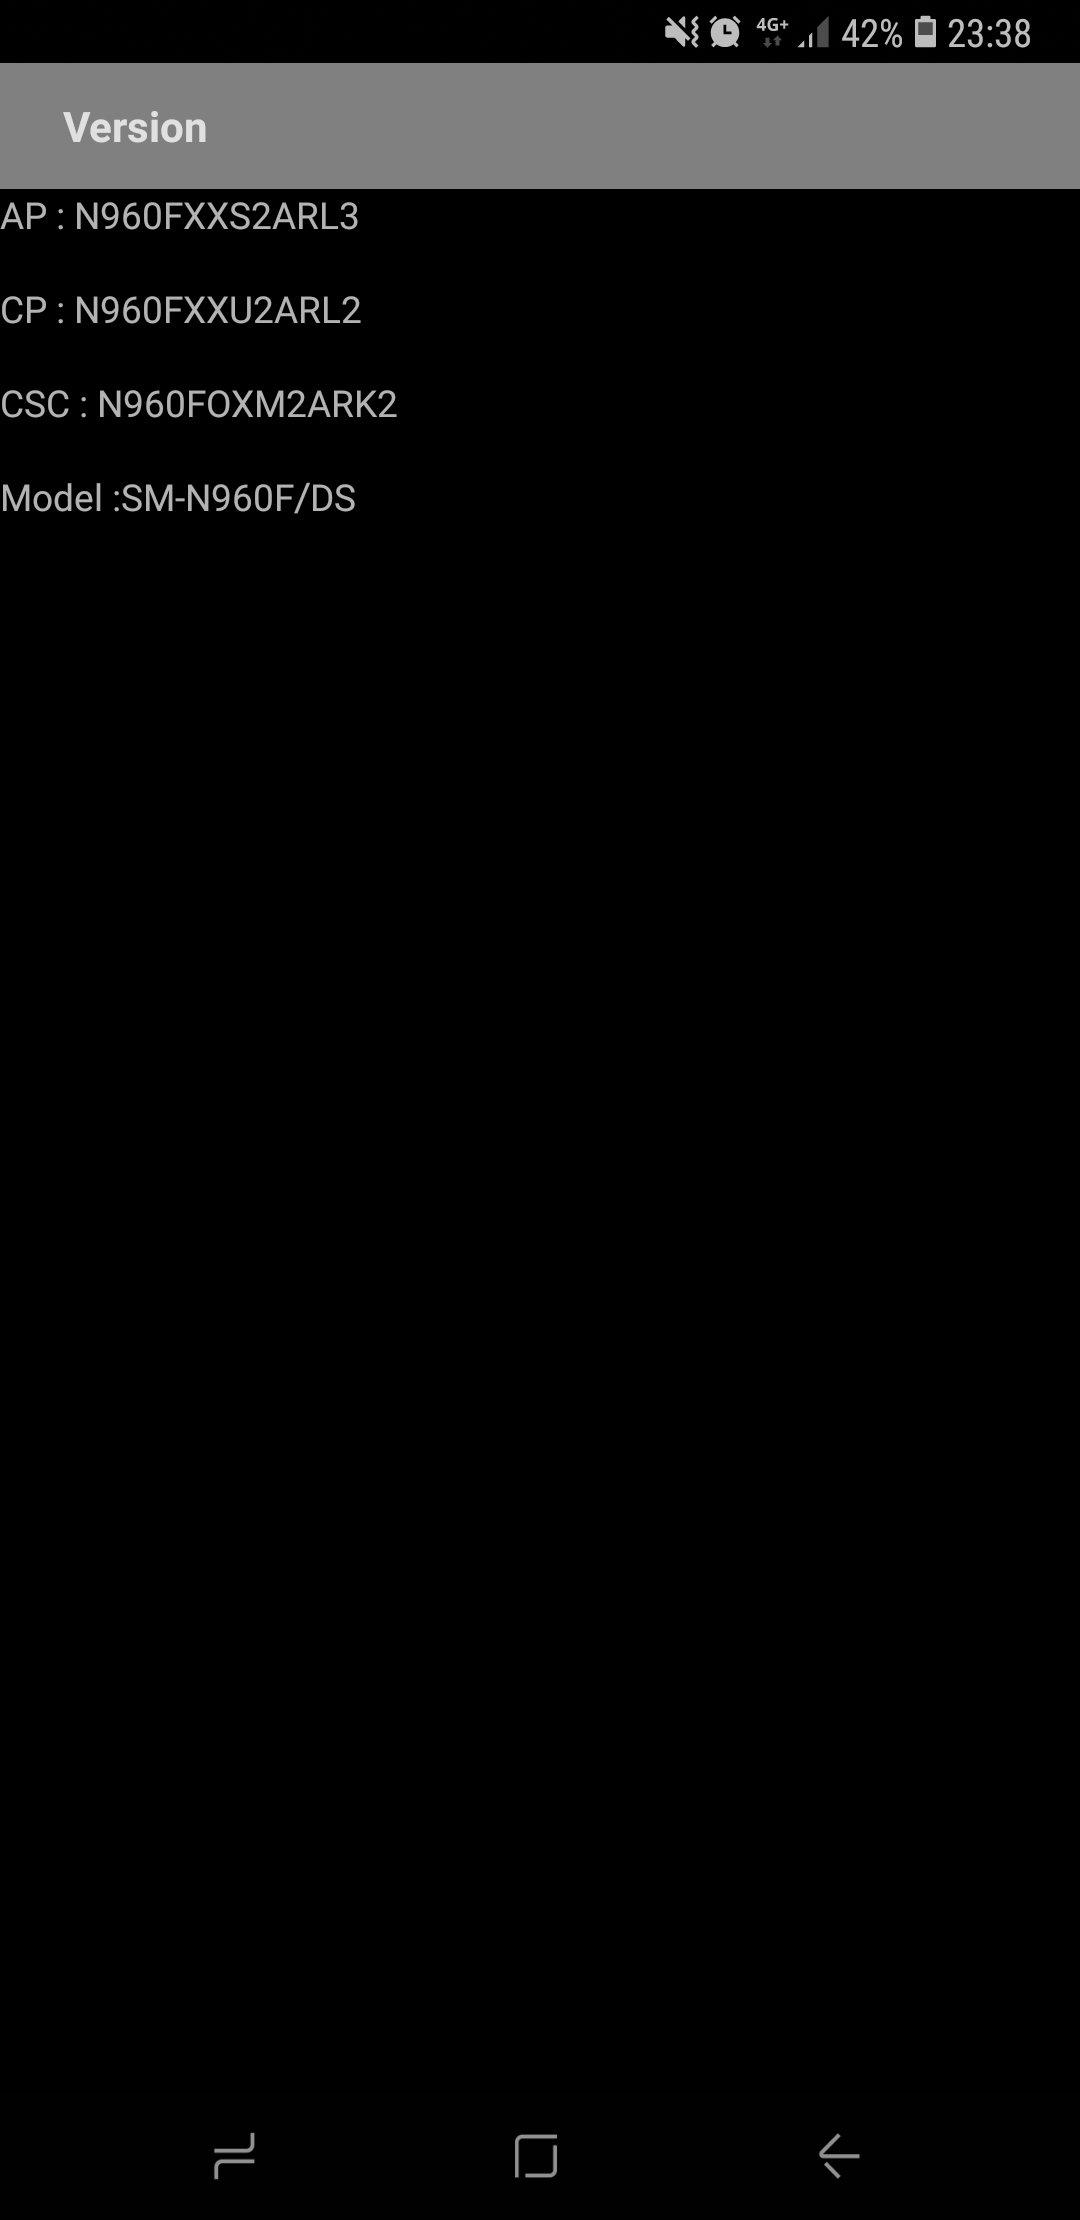 Screenshot_20181218-233802_DeviceKeystring.jpeg